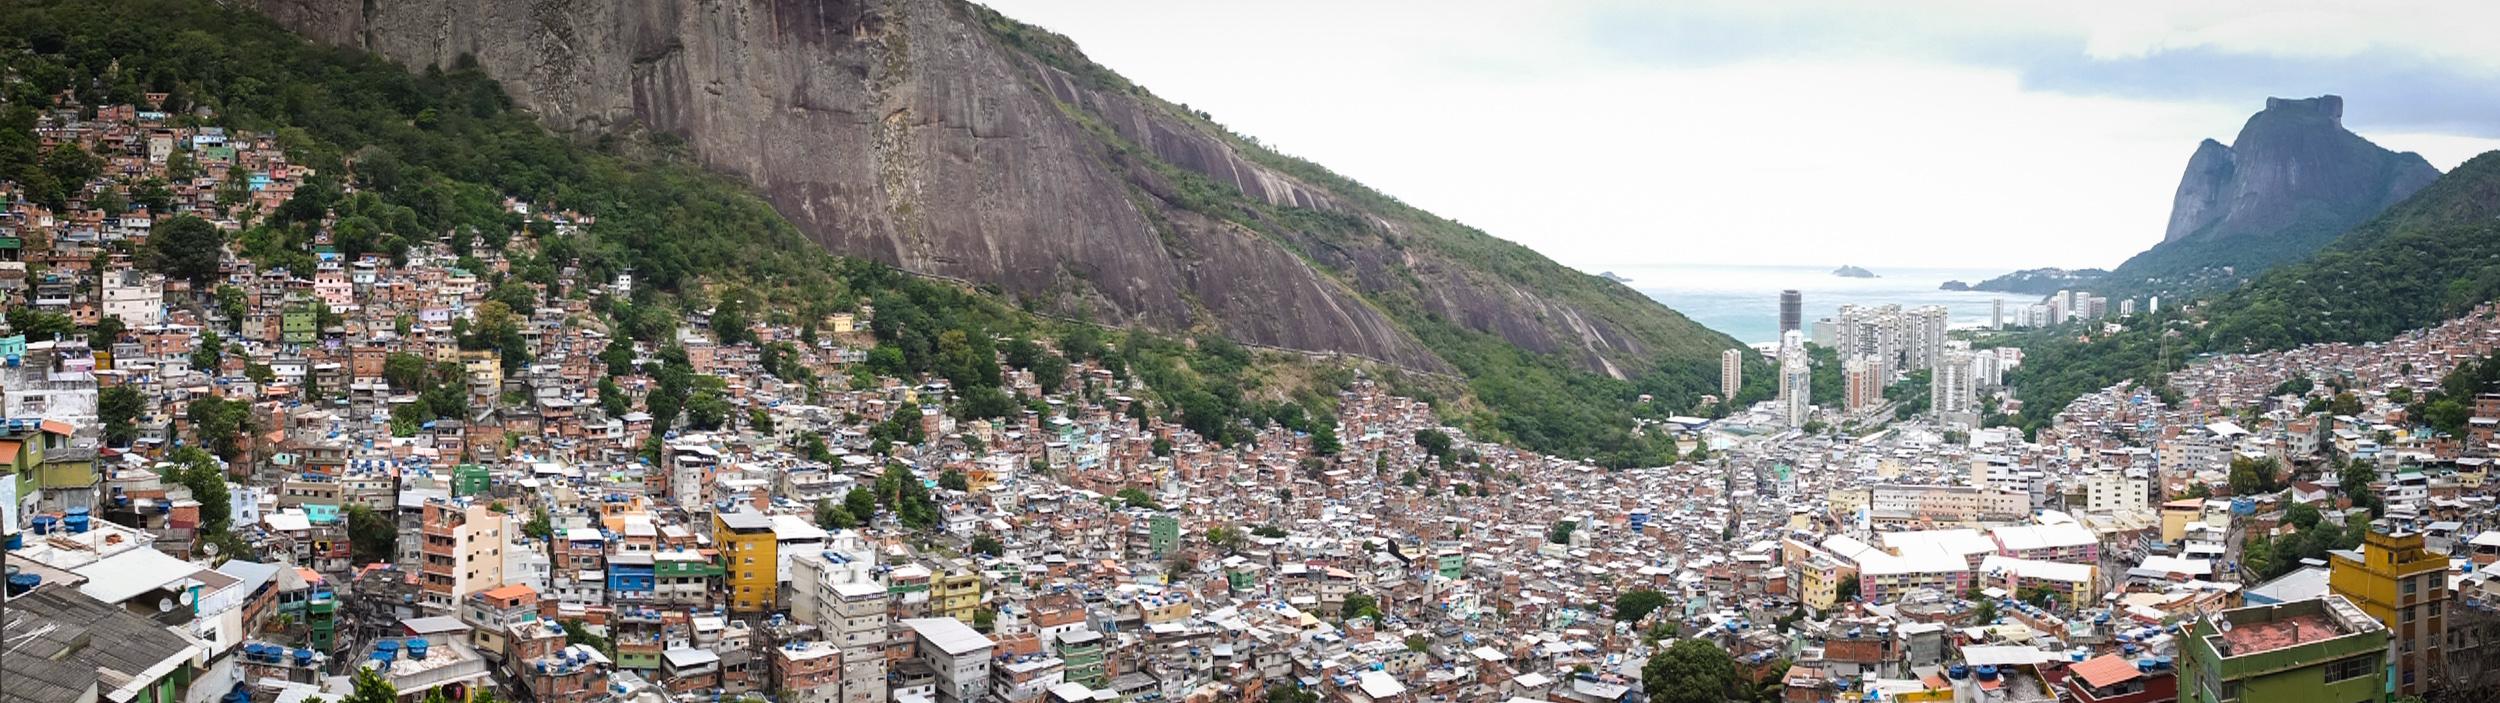 brasil-388.jpg